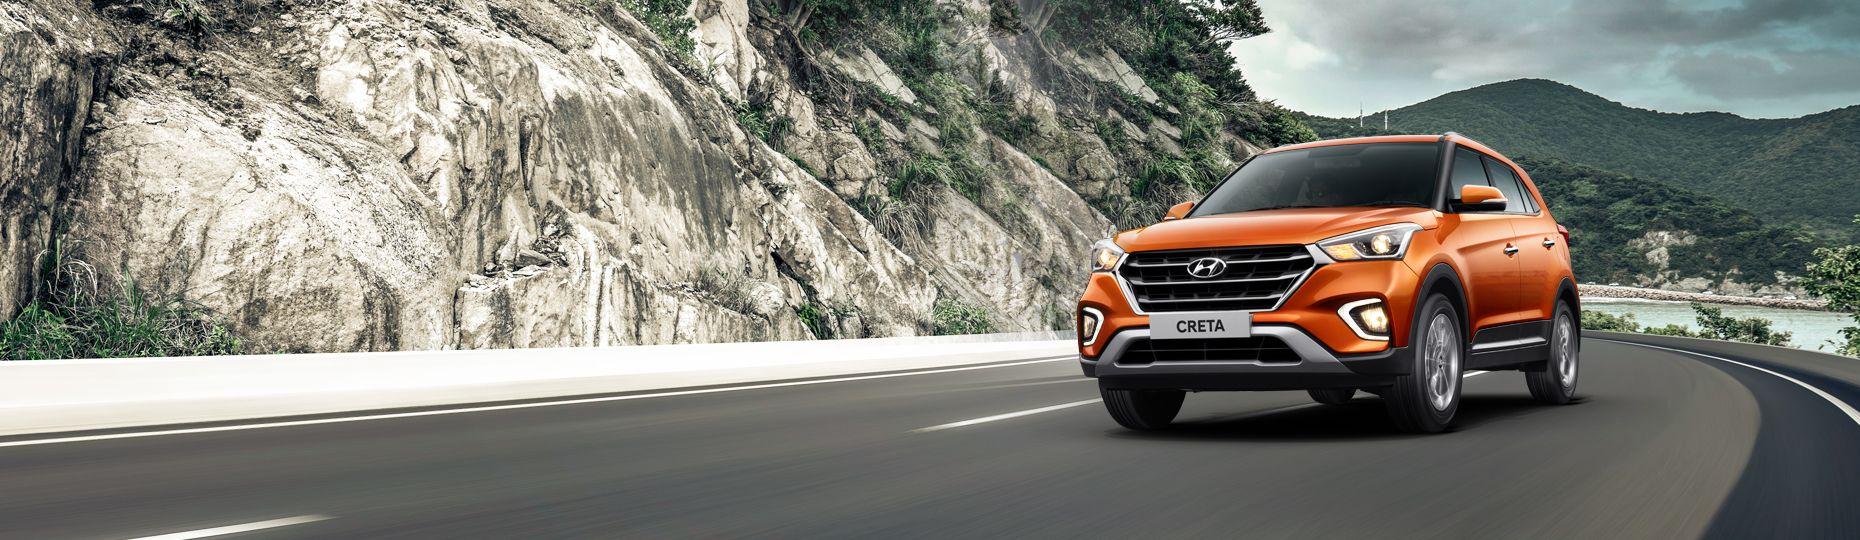 Hyundai Creta Top 6 Features for Perfect SUV Hyundai